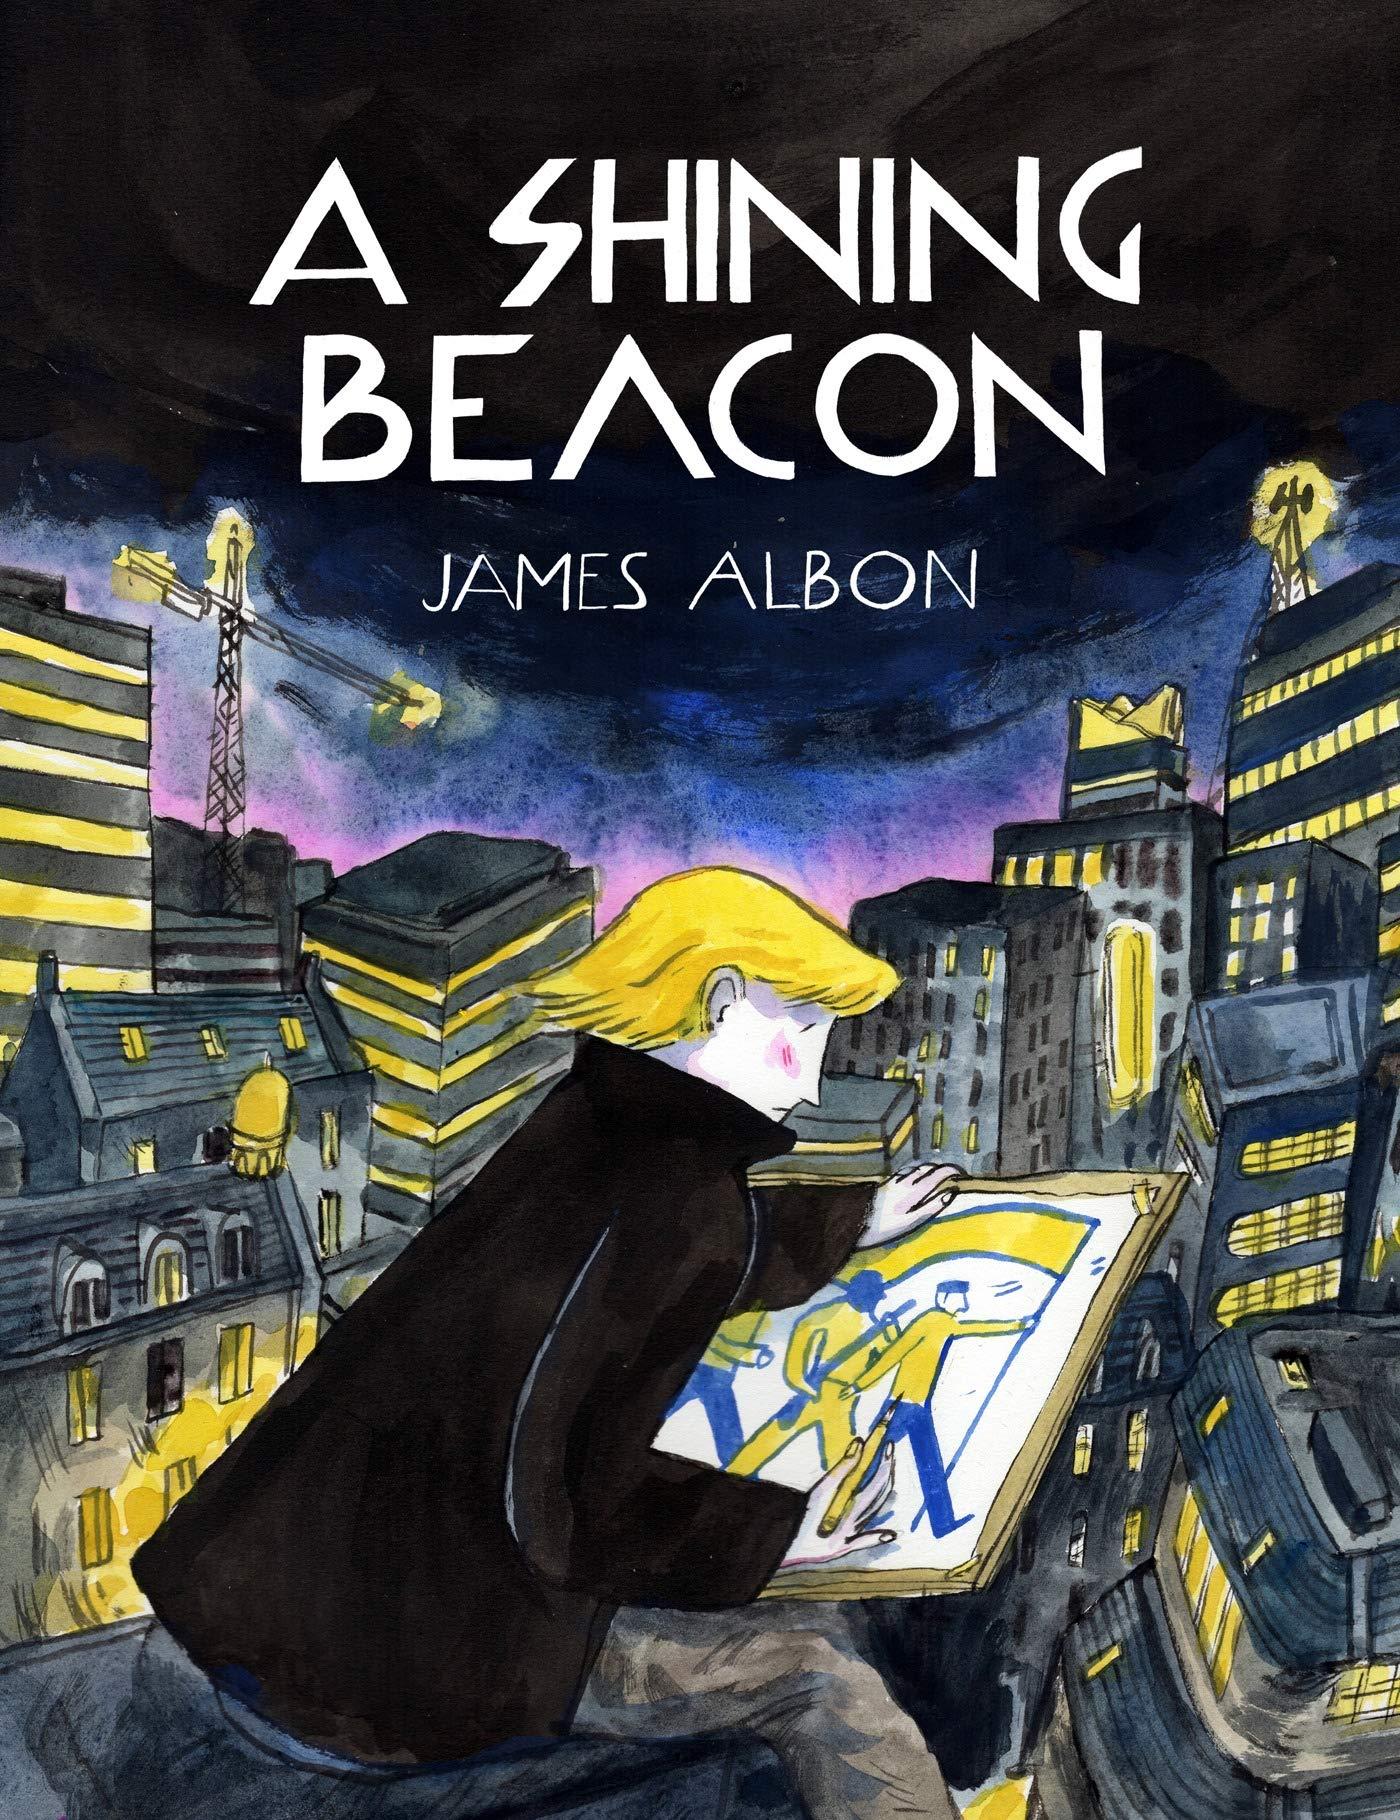 Best Comics of 2019: A Shining Beacon